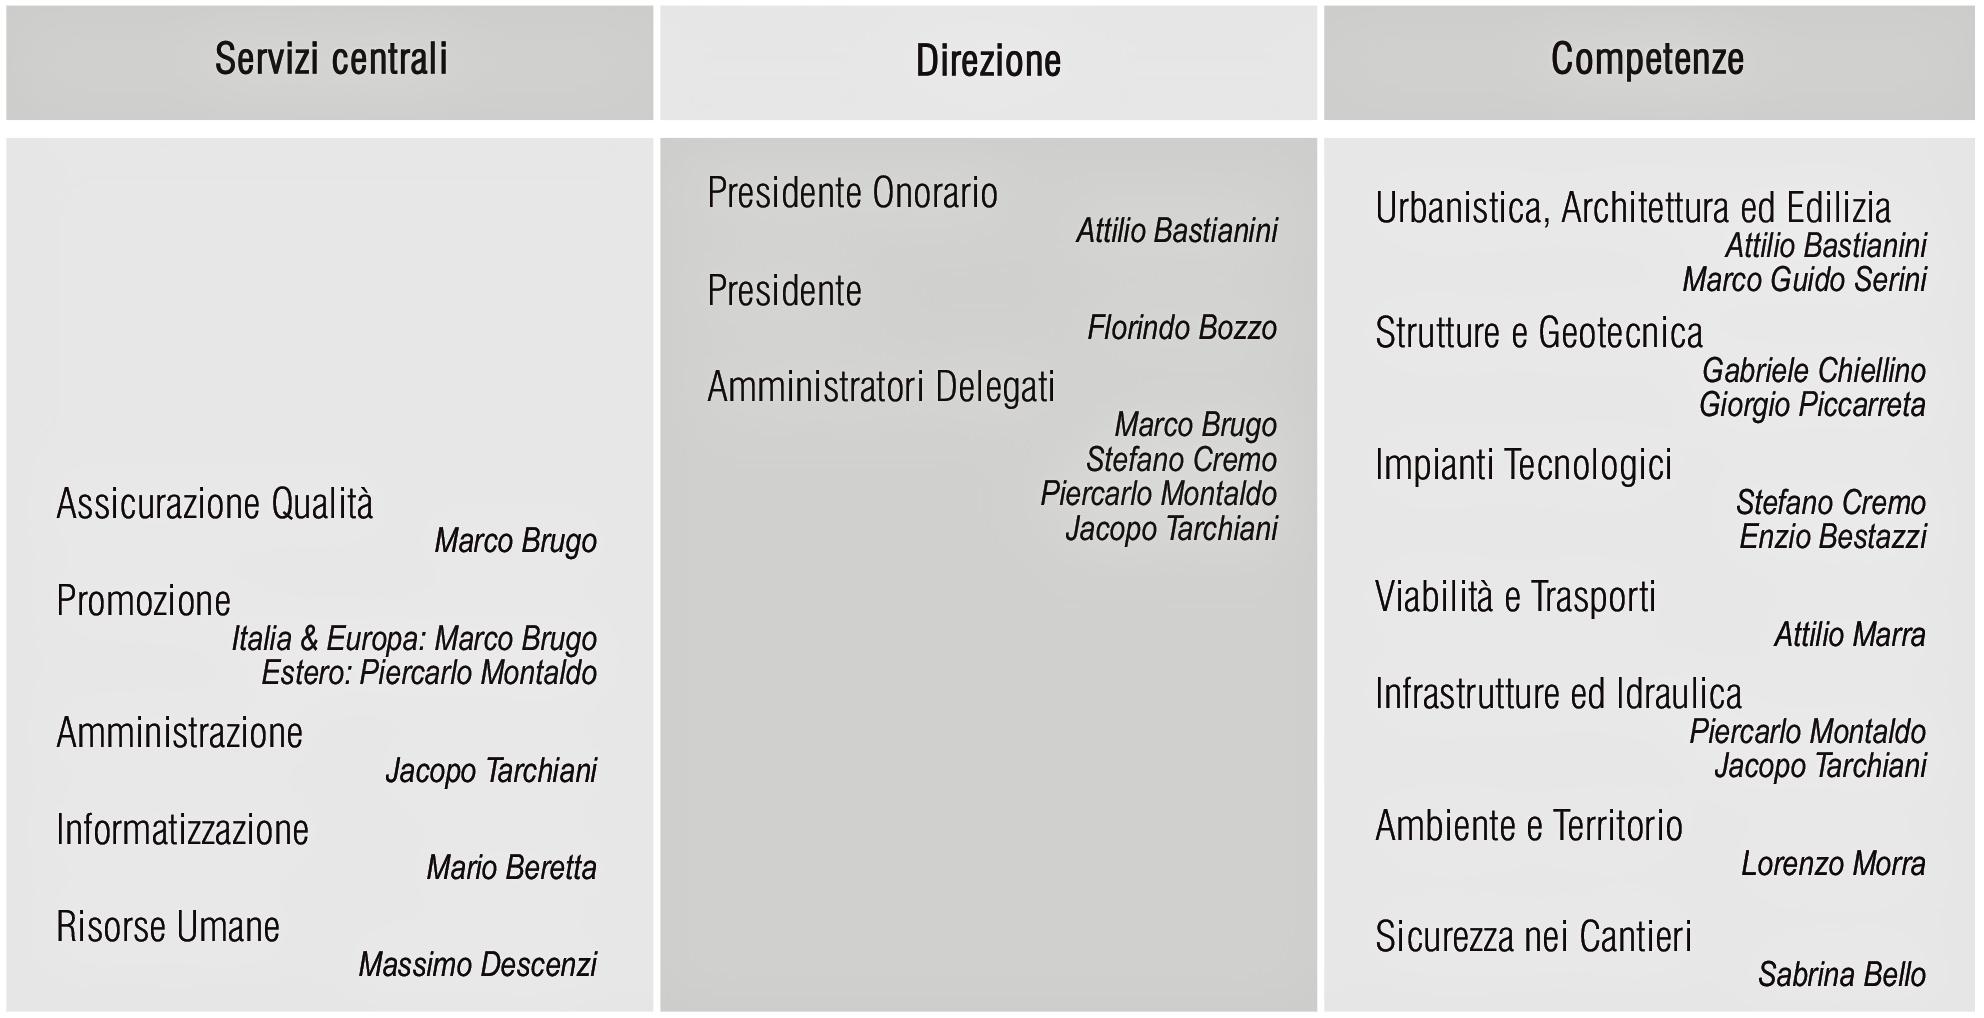 00 - Profilo 2014 rev03:Layout 1.qxd